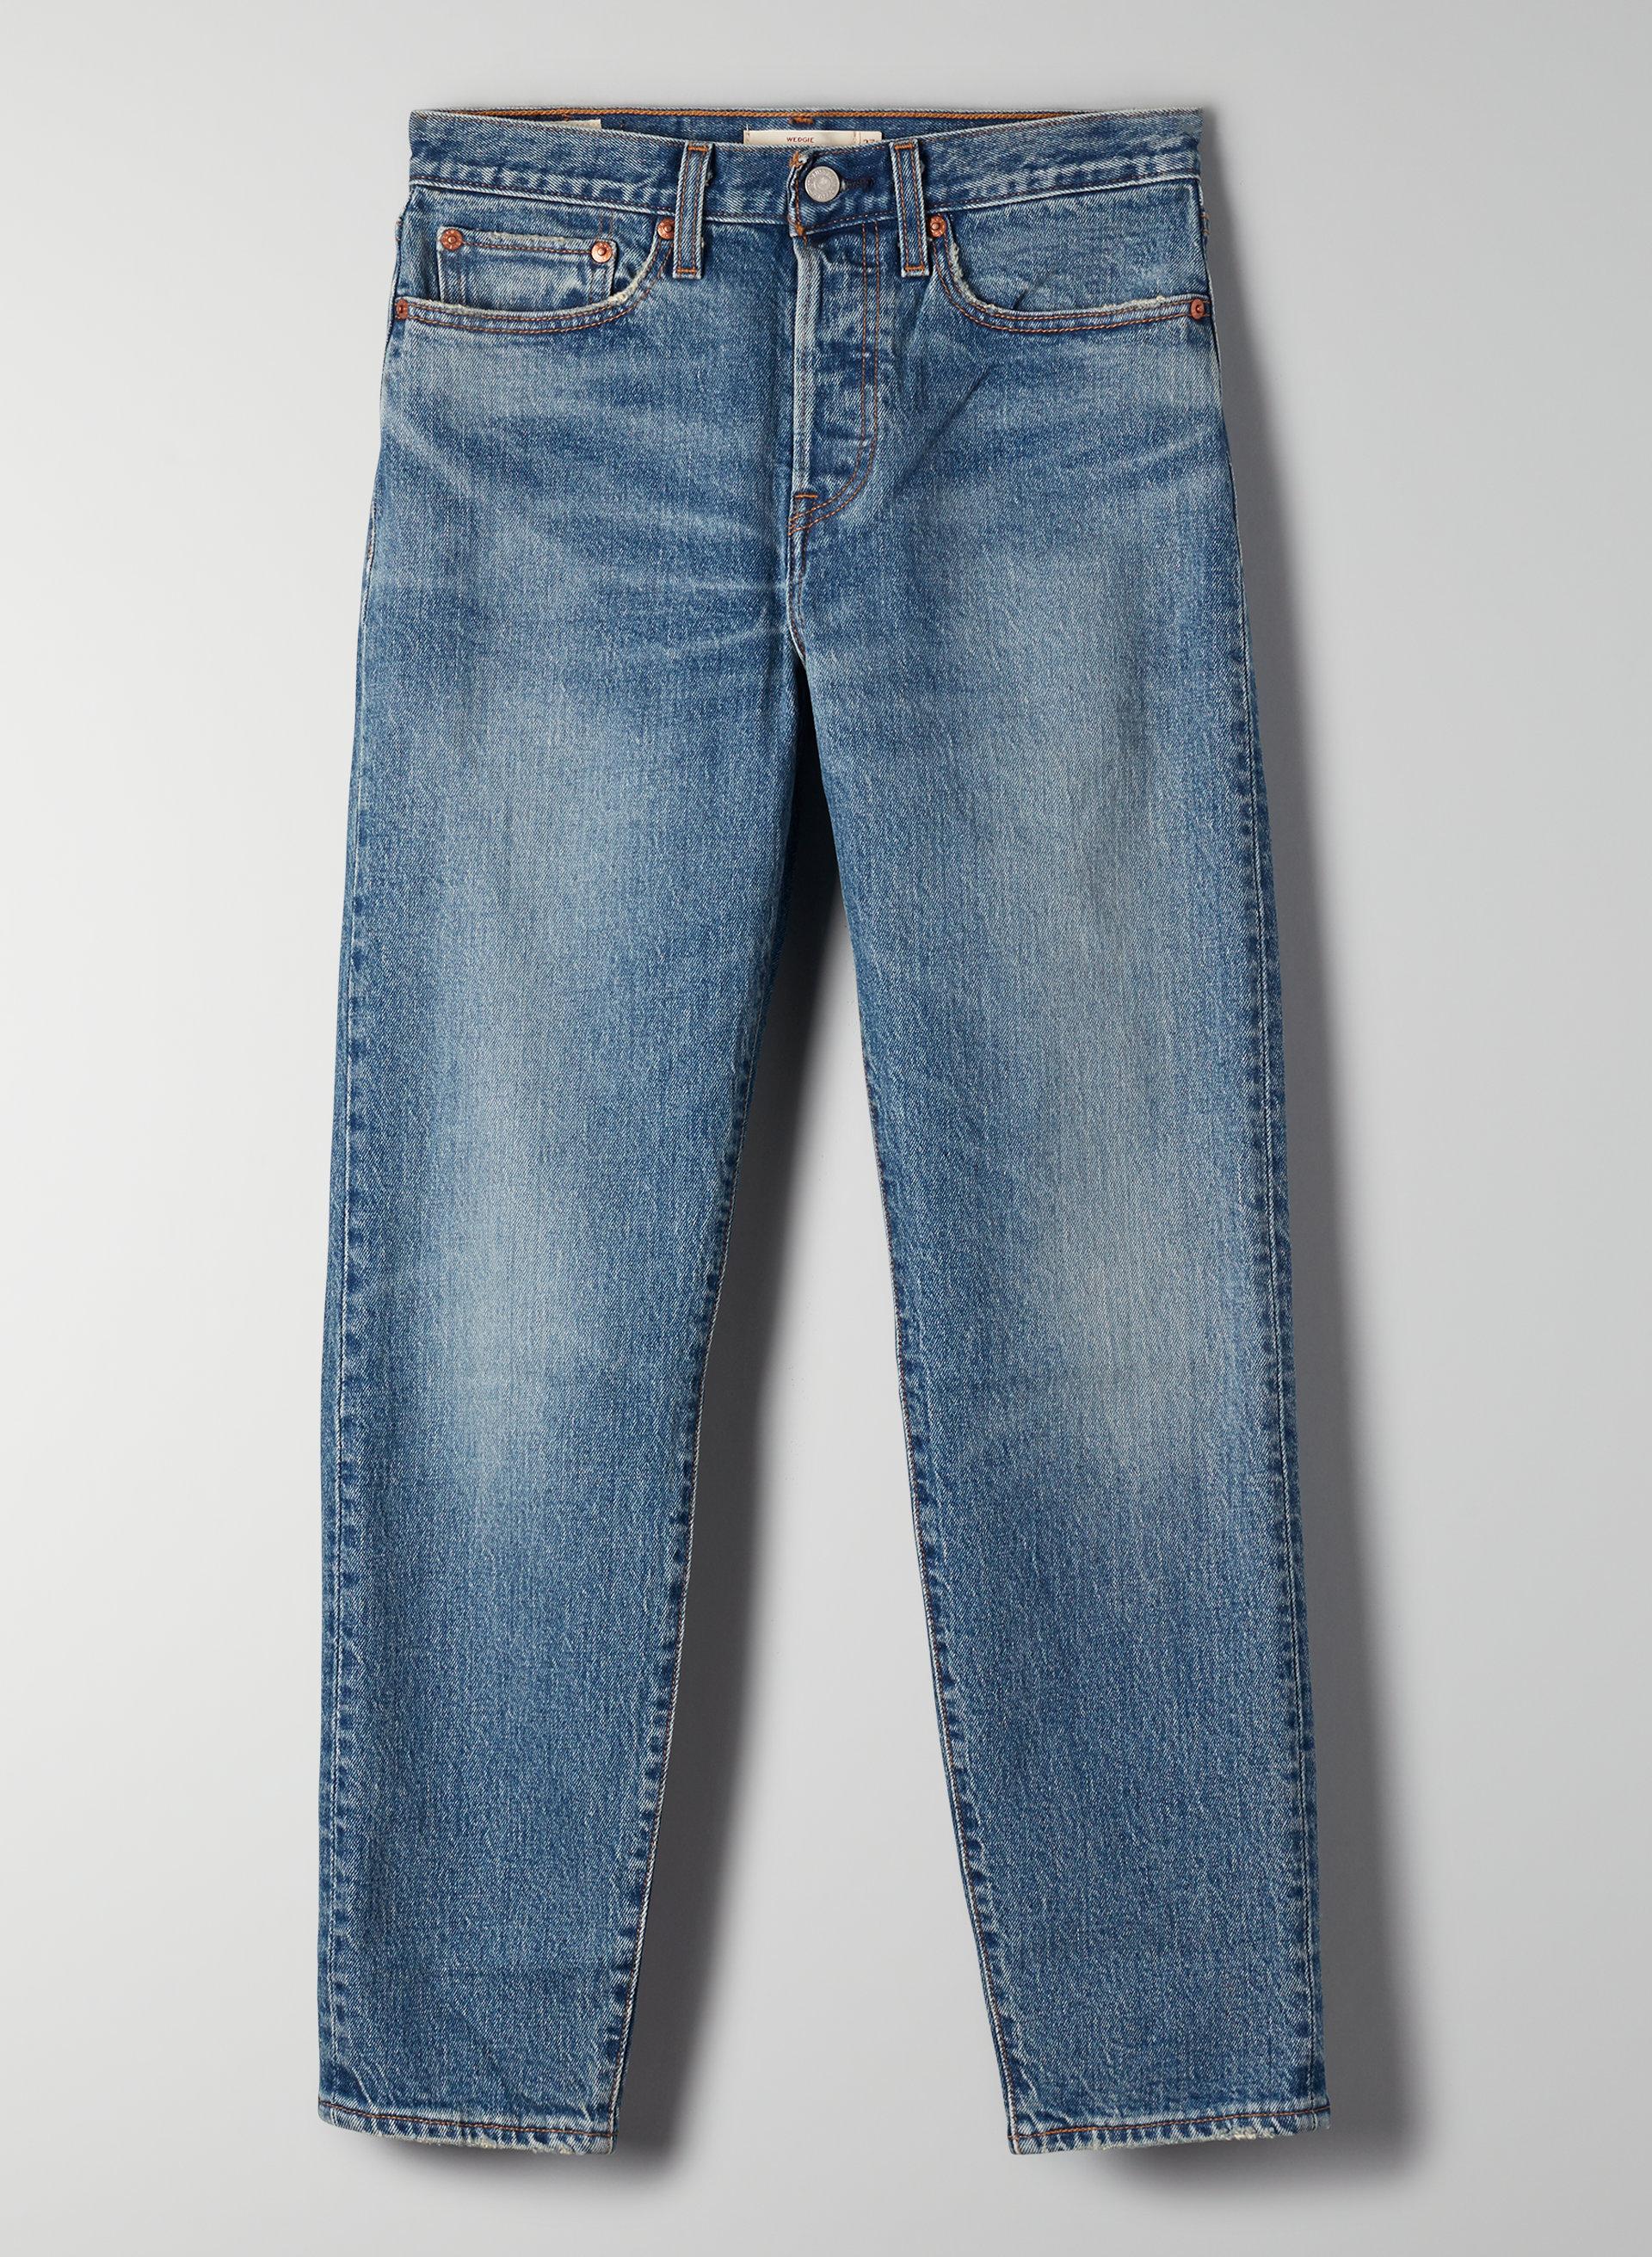 ac93aee9 WEDGIE ICON - High-waisted, skinny jean